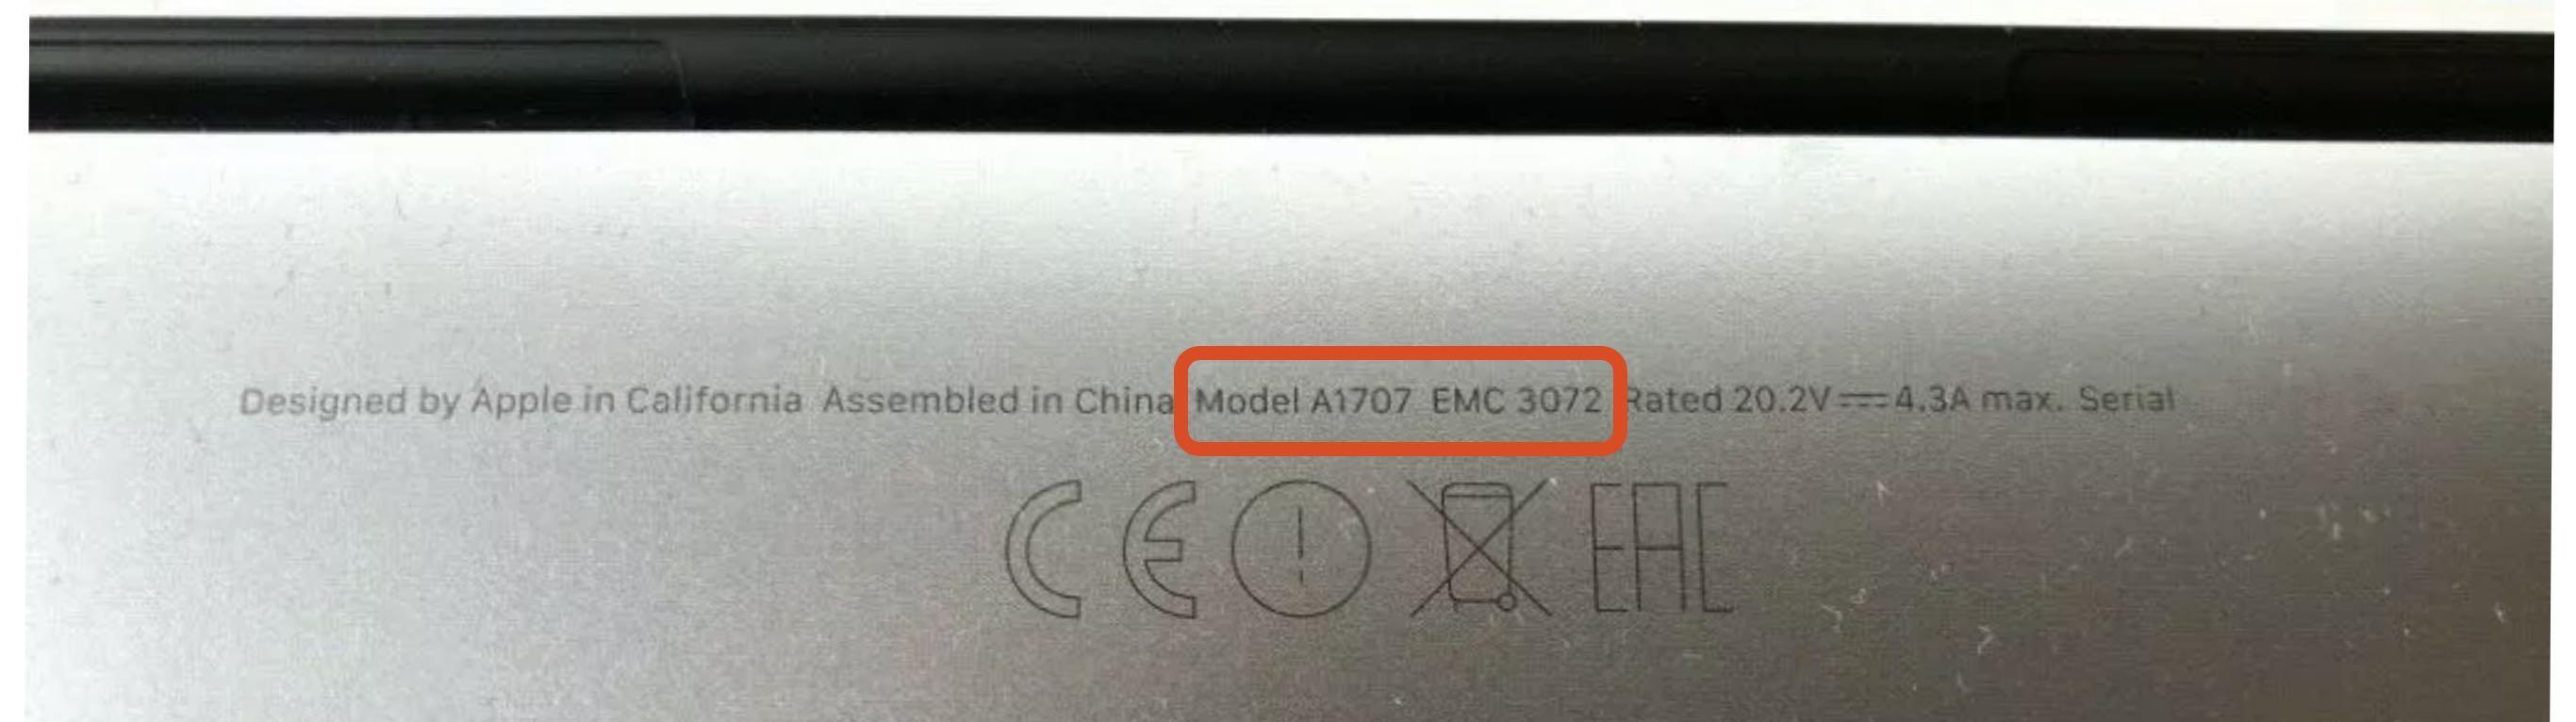 bestimmung der seriennummern profi repair reparatur f r apple iphone canon ixus. Black Bedroom Furniture Sets. Home Design Ideas